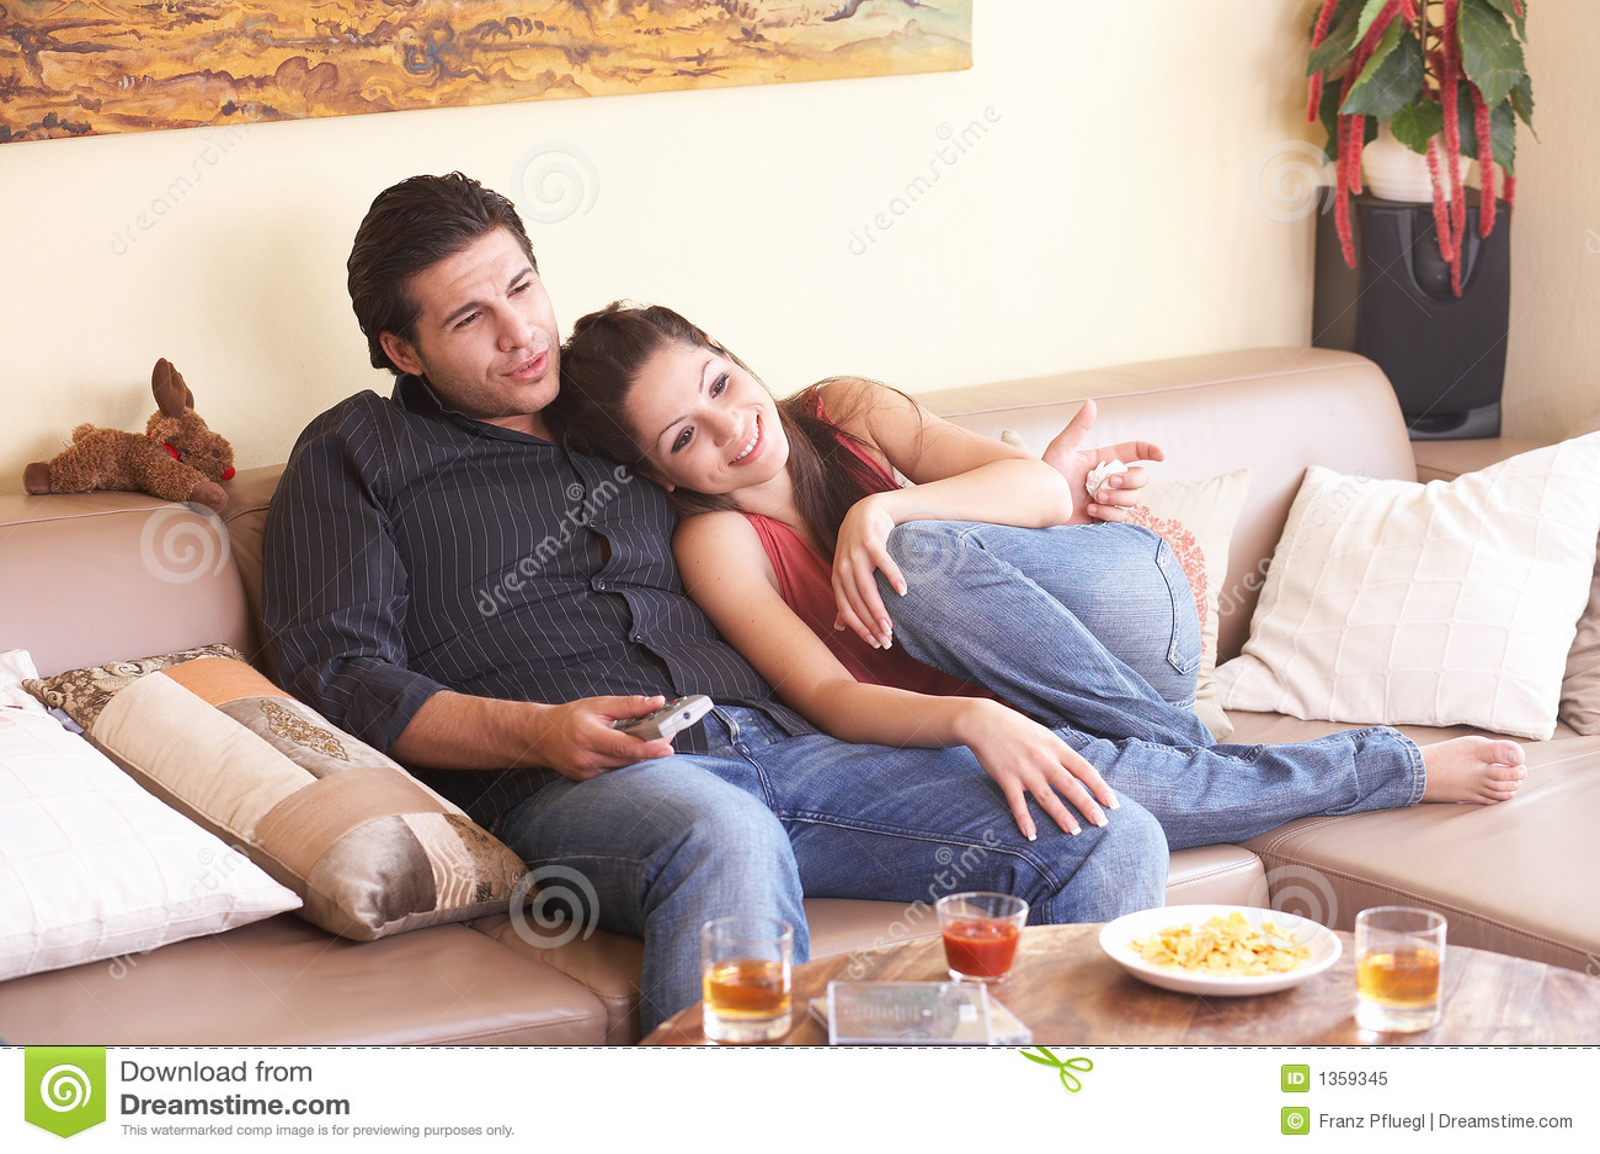 знакомство супружеских пар в краснодаре